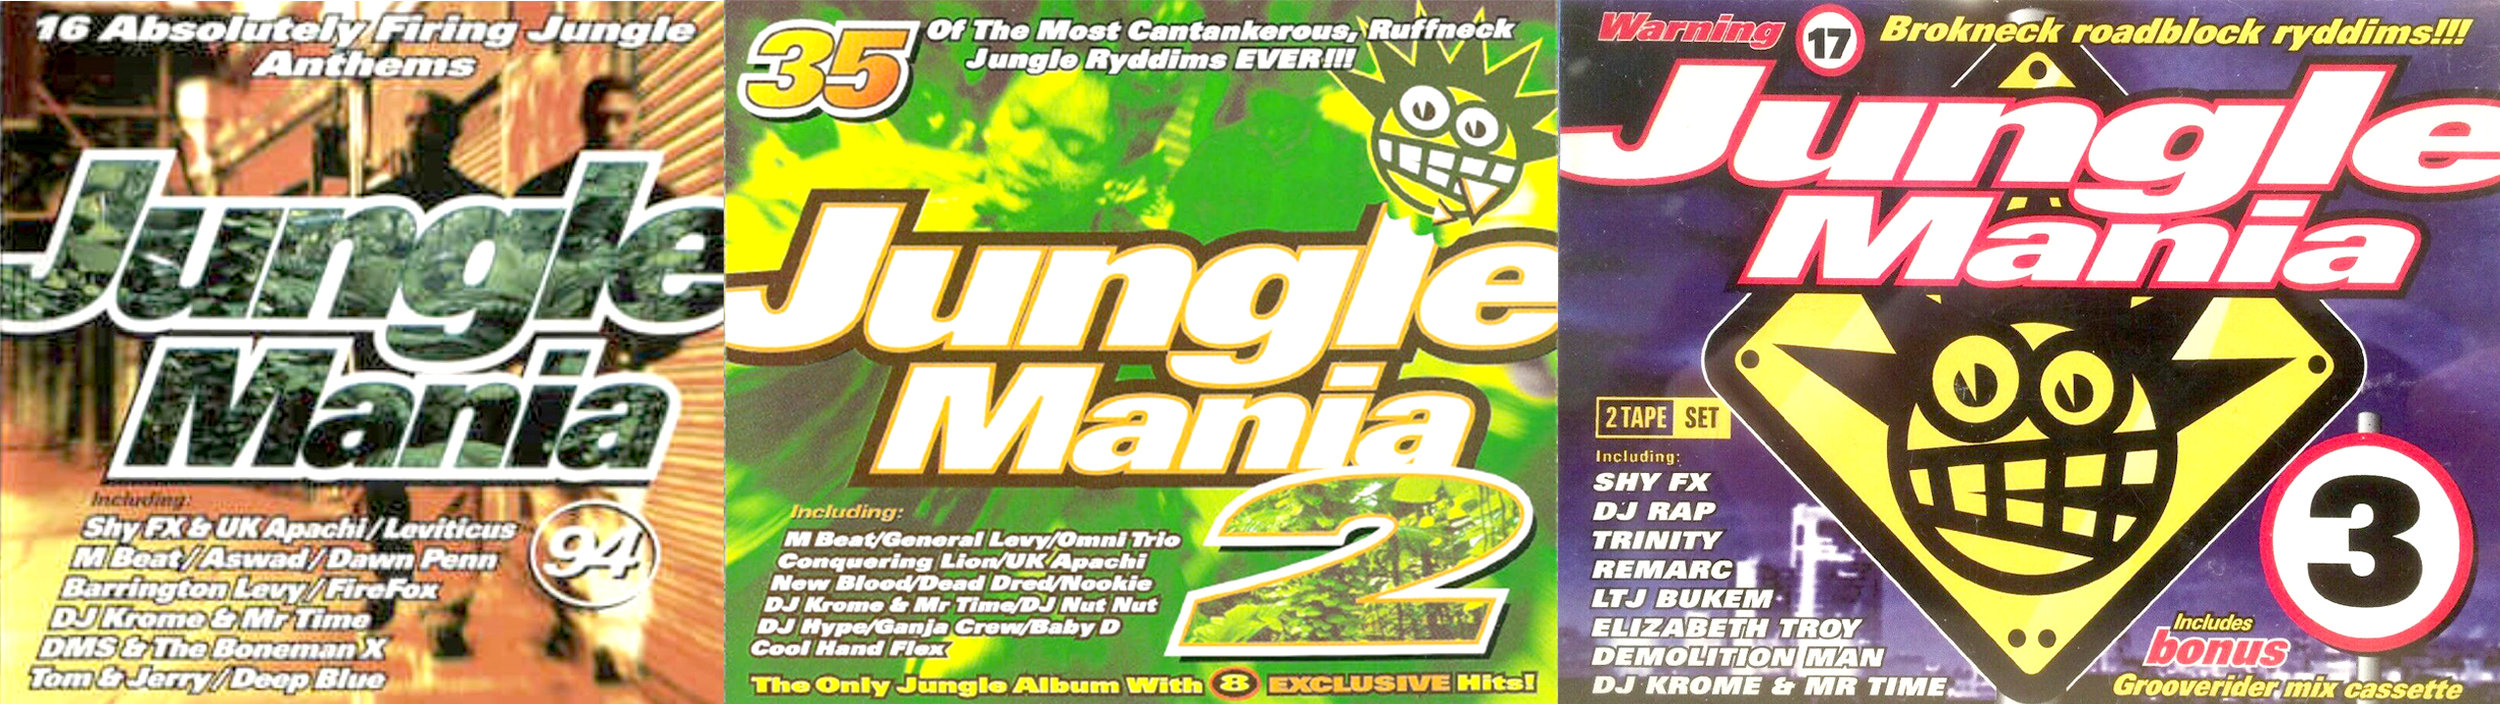 JungleMania-collage-1.jpg